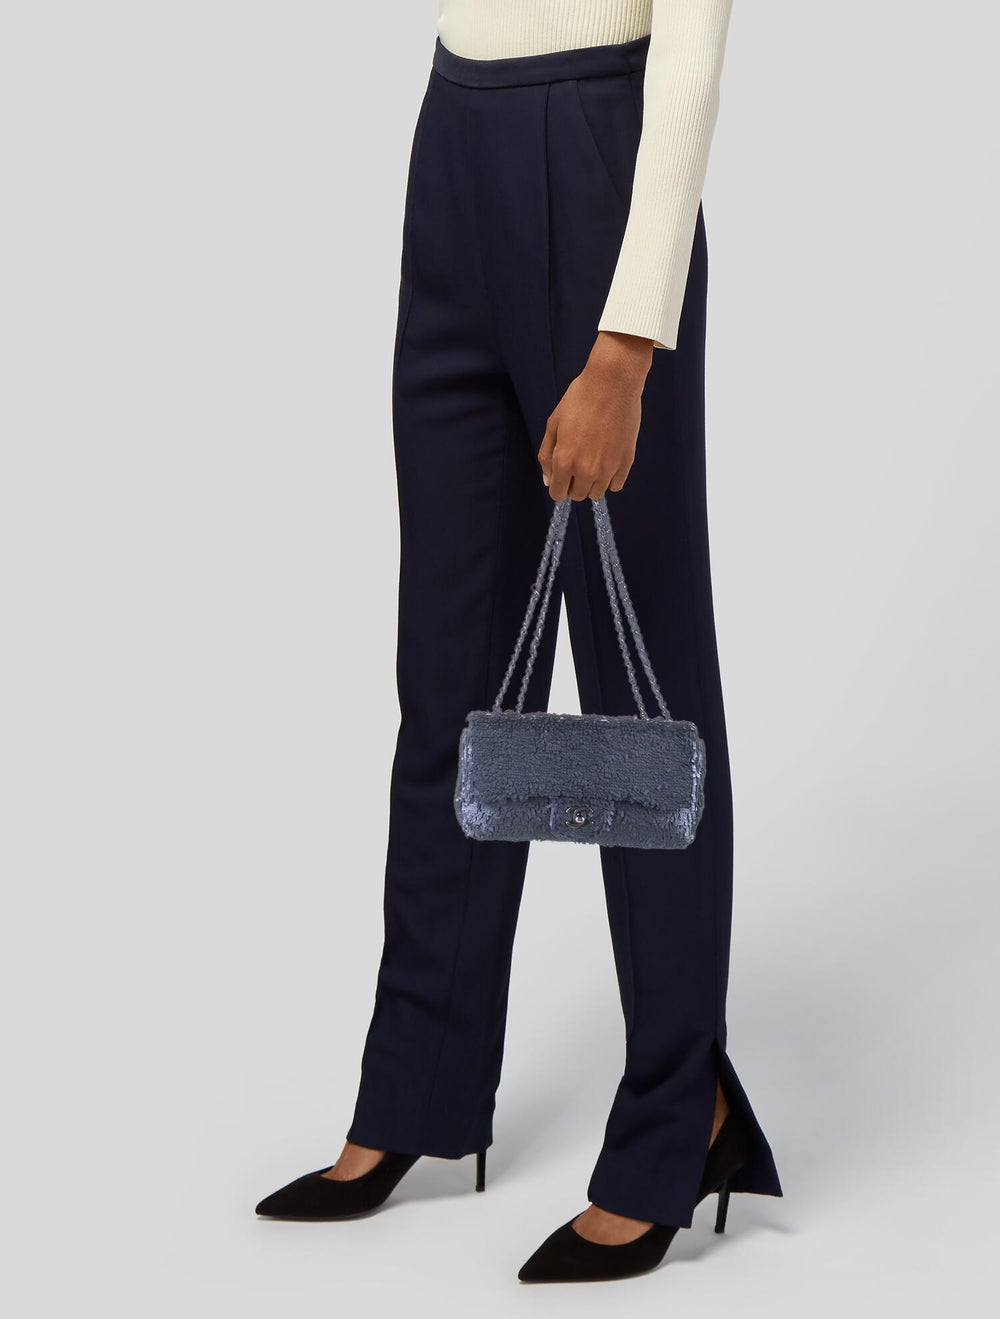 Chanel Sequin Flap Bag Blue - image 2